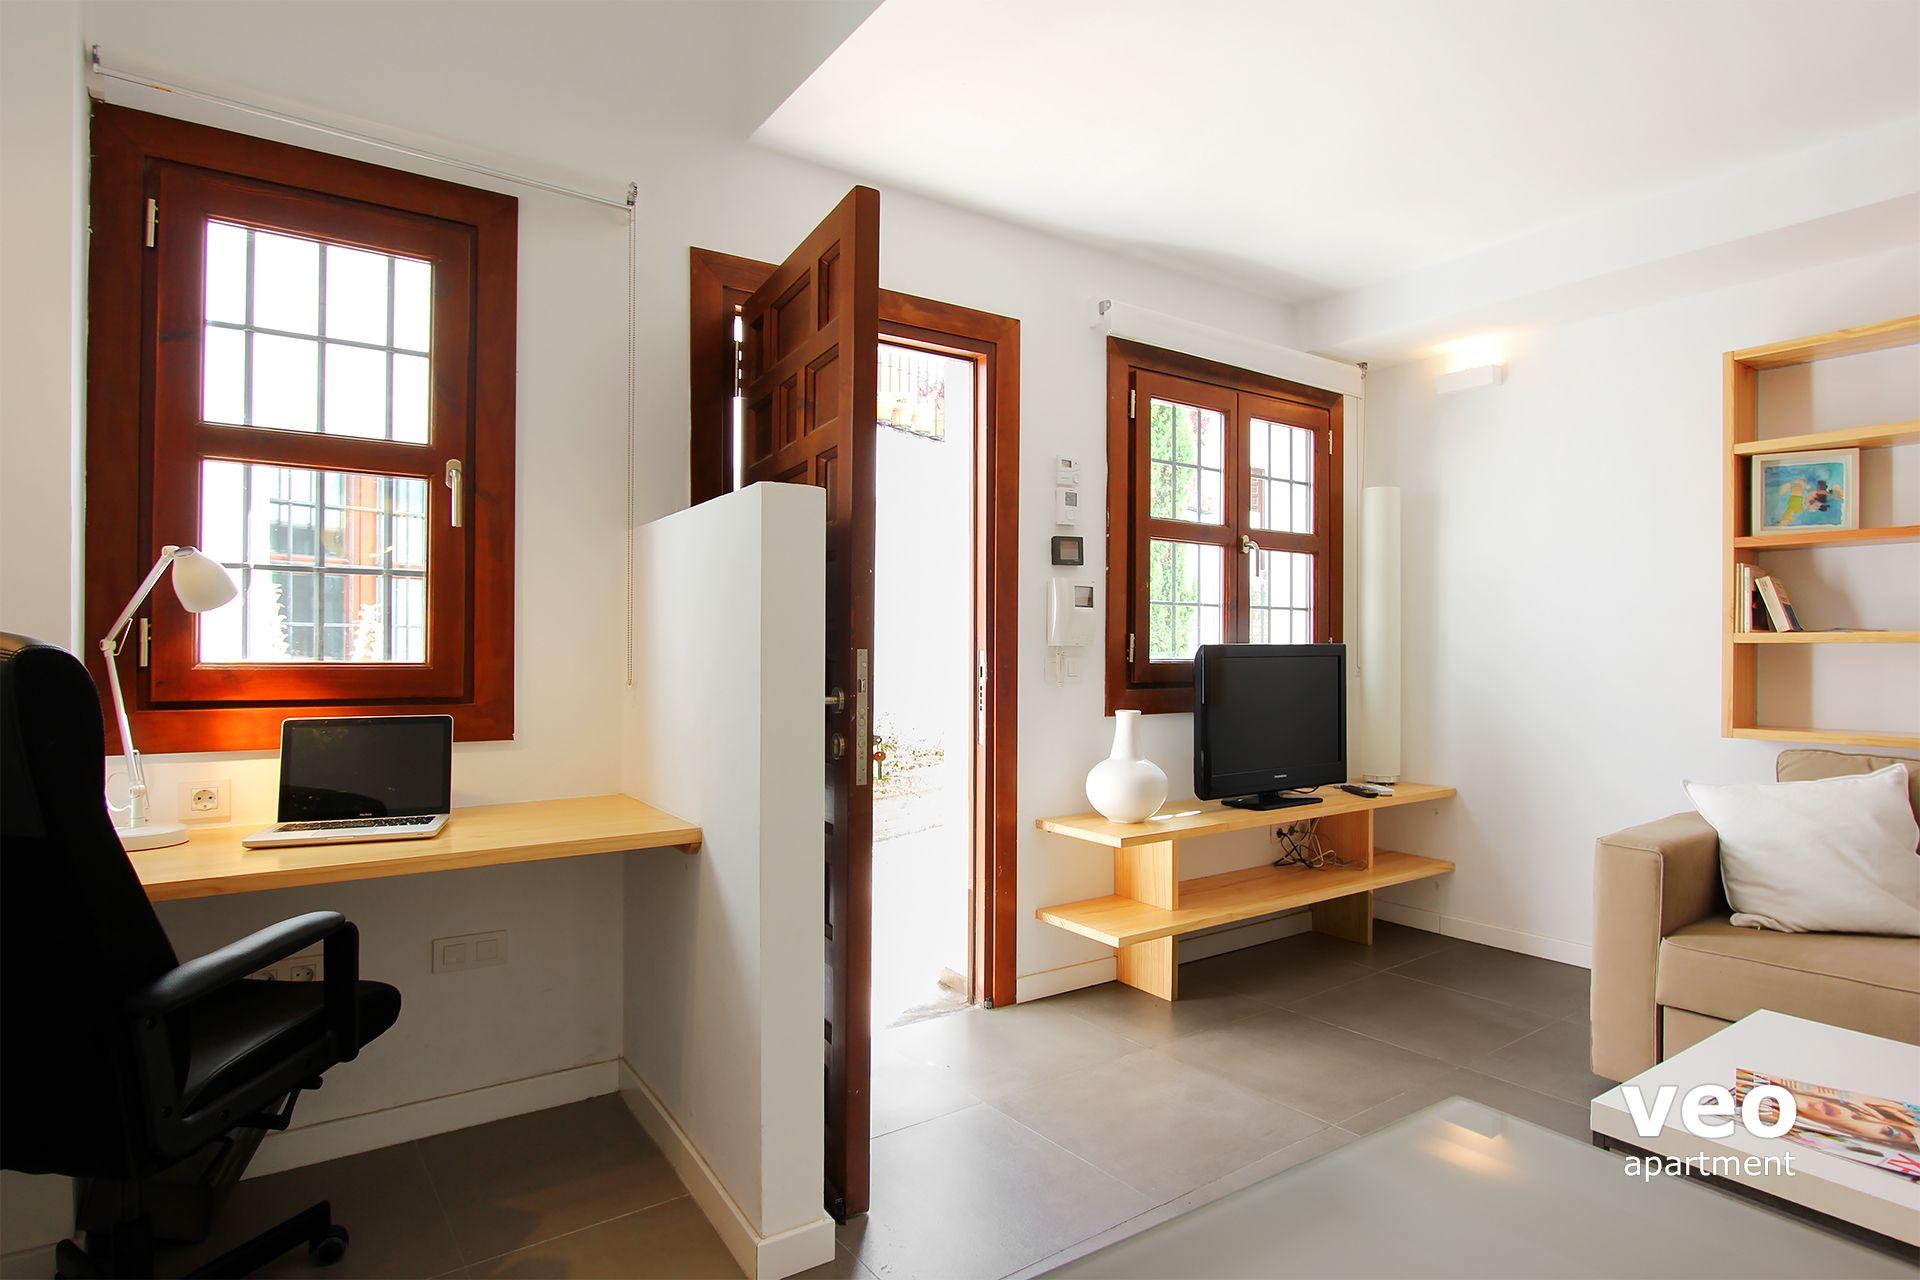 appartement rue san jos alta s ville espagne san jos 2 terrasse location d 39 appartement. Black Bedroom Furniture Sets. Home Design Ideas